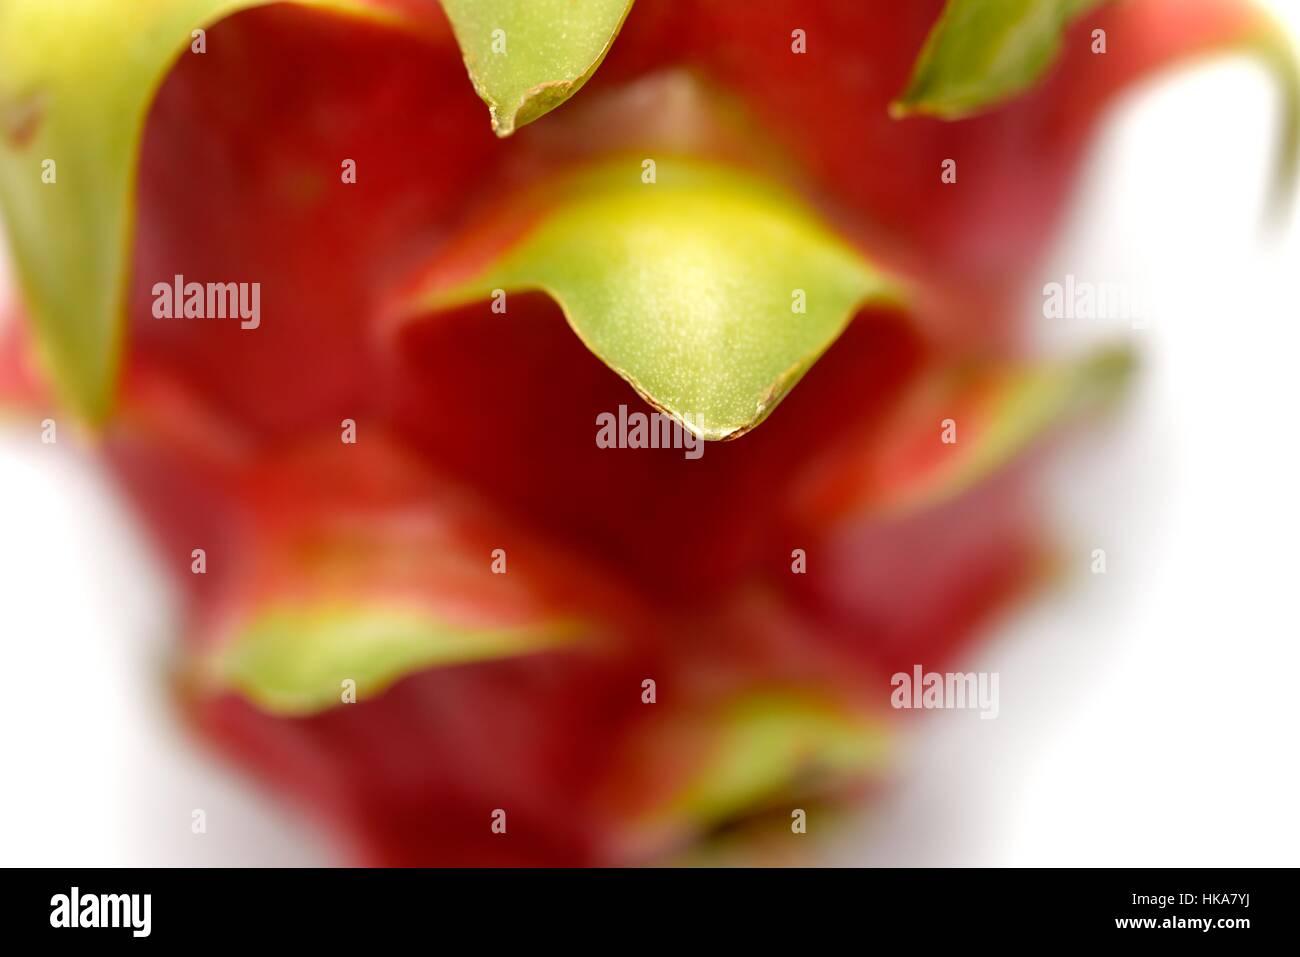 Pitaya Pitahaya blanca white fruit close up macro. - Stock Image